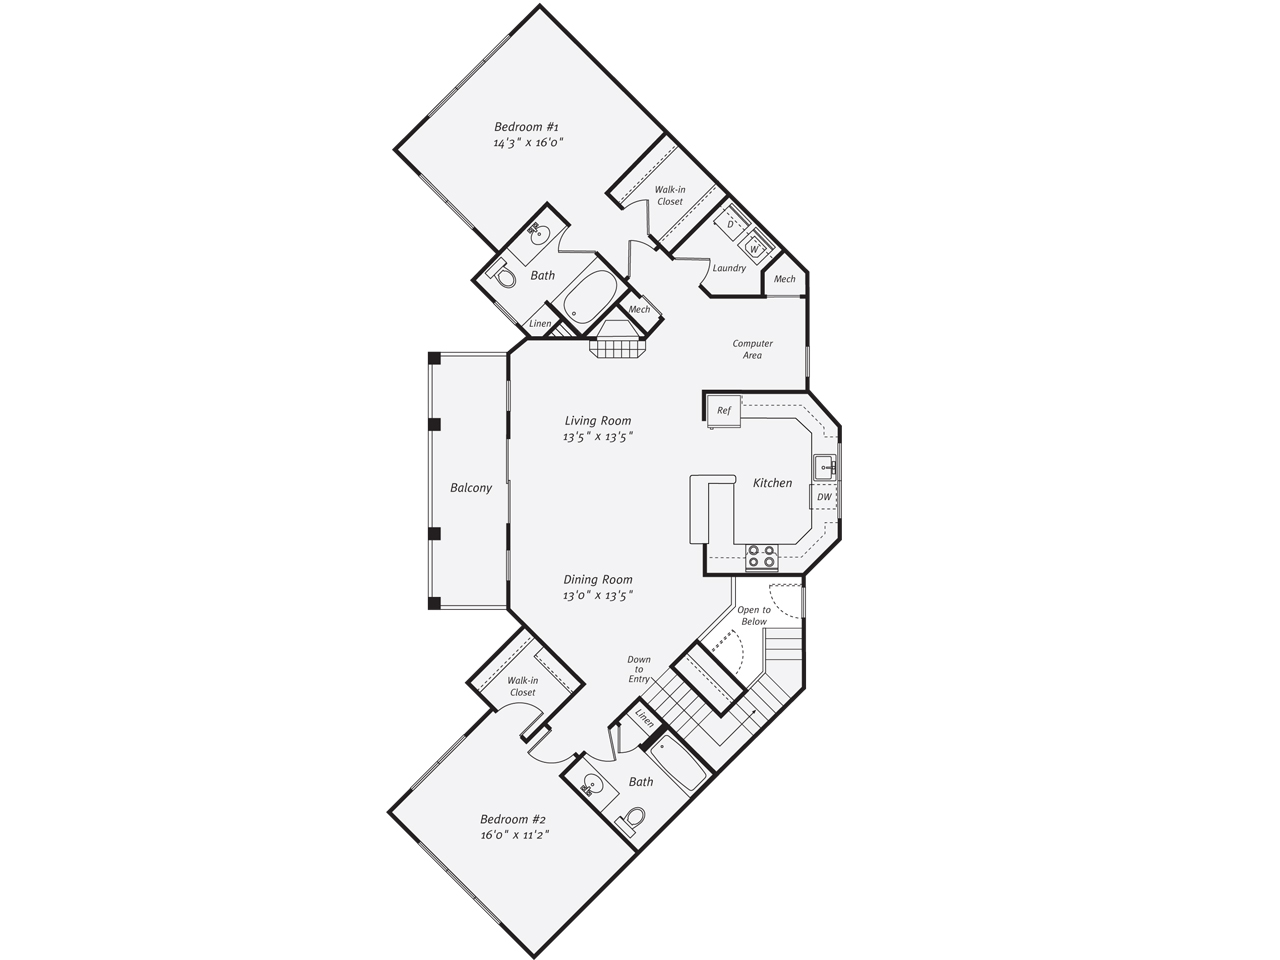 Ny coram thepointatpineridge p0571769 ny014 b12 2 floorplan